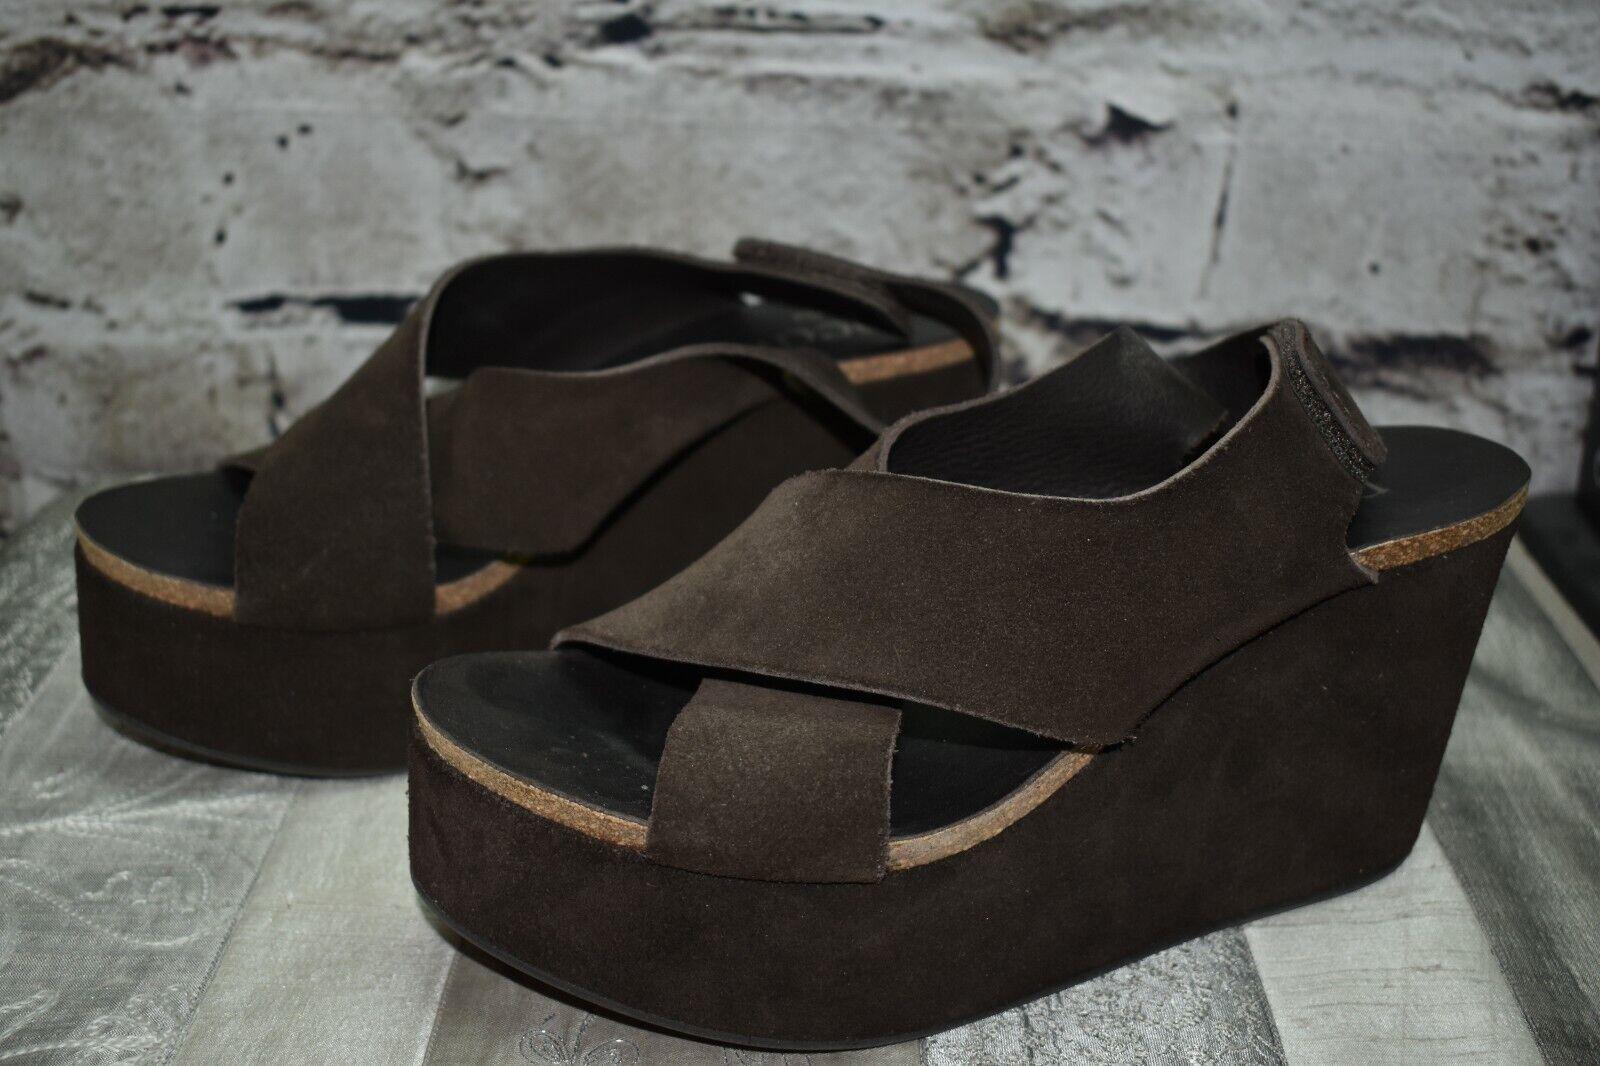 Pedro Garcia EU 38.5 US 8.5 Marian Marronee Leather  Sue Platform Sandals Heels  colorways incredibili